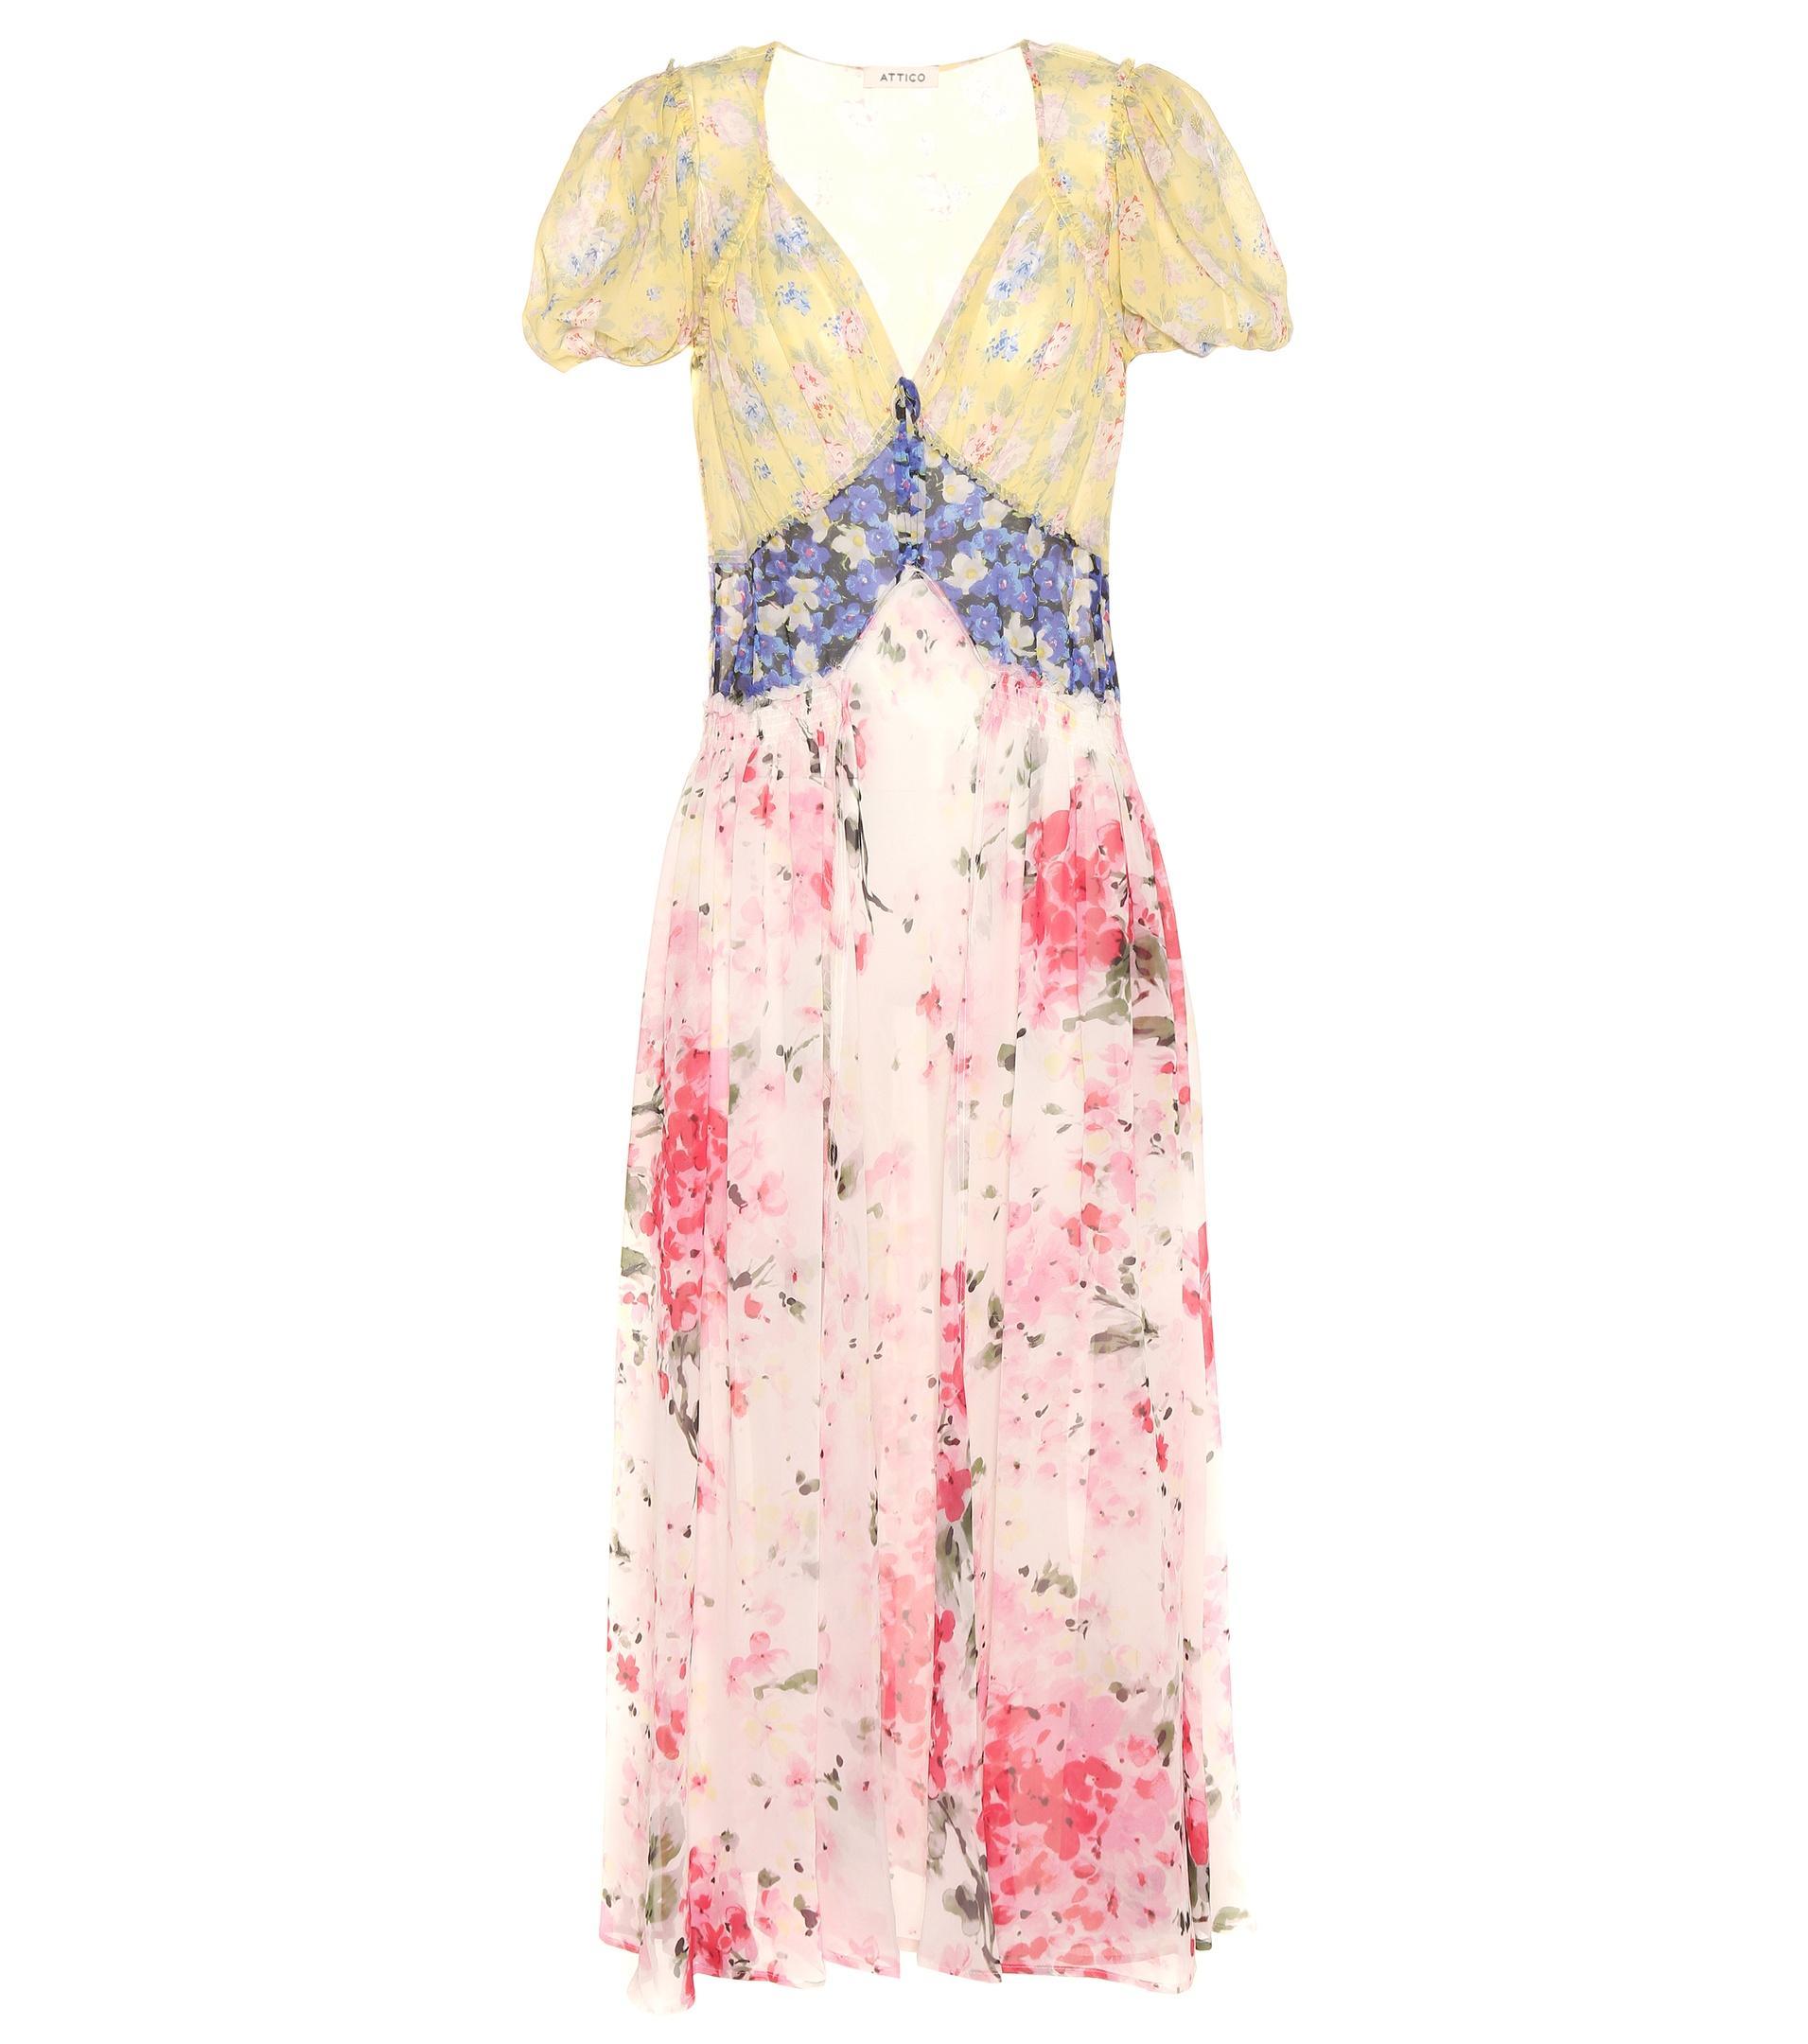 Lyst Attico Natalia Floral Printed Silk Dress In Pink